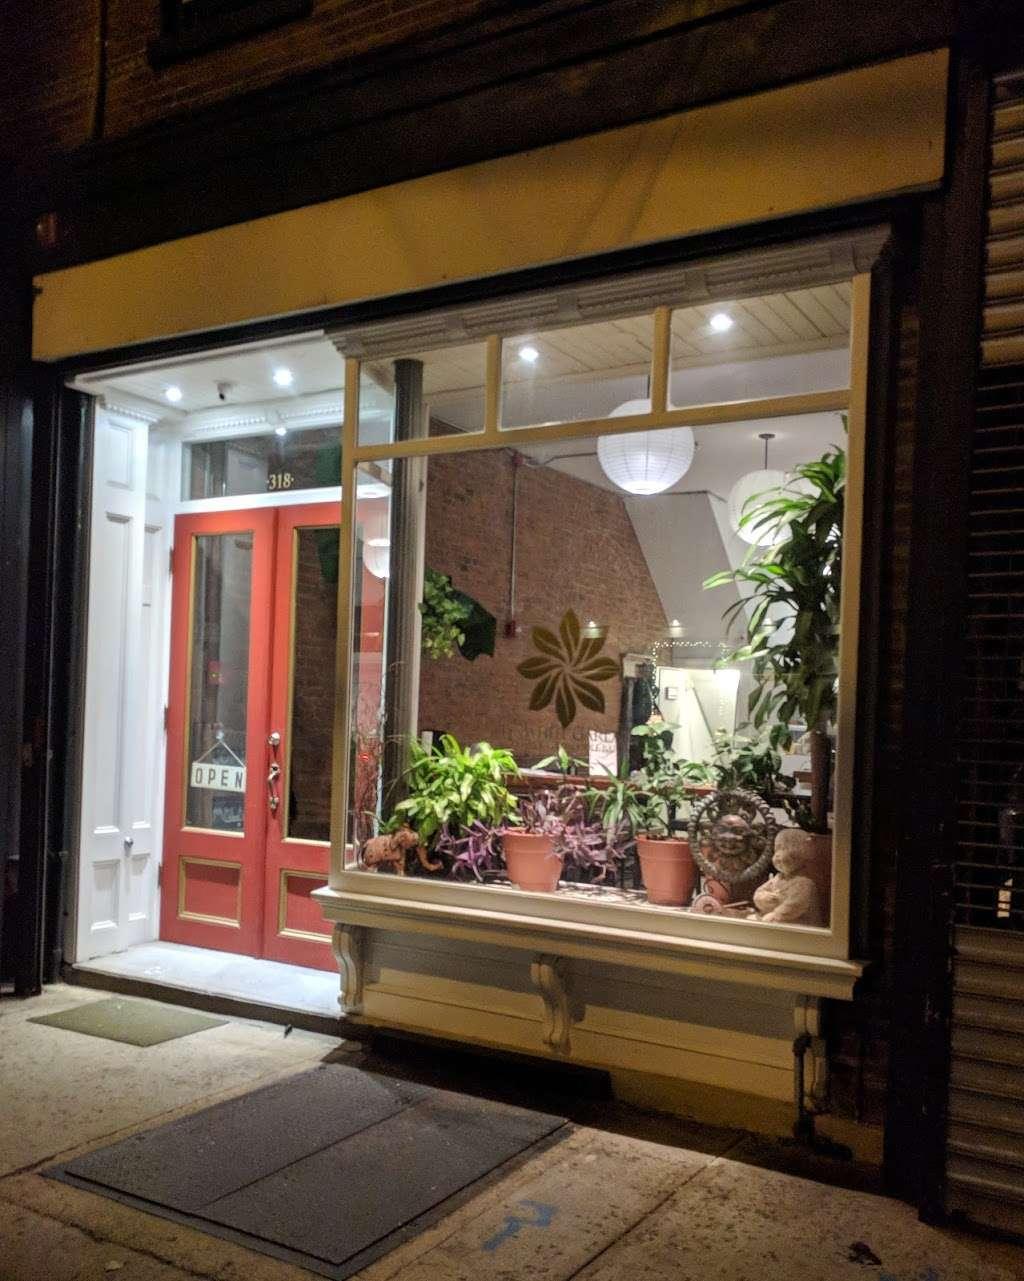 Pinwheel Garden Dumpling & Noodle Bar - restaurant  | Photo 3 of 10 | Address: 318 Communipaw Ave, Jersey City, NJ 07304, USA | Phone: (201) 413-5333